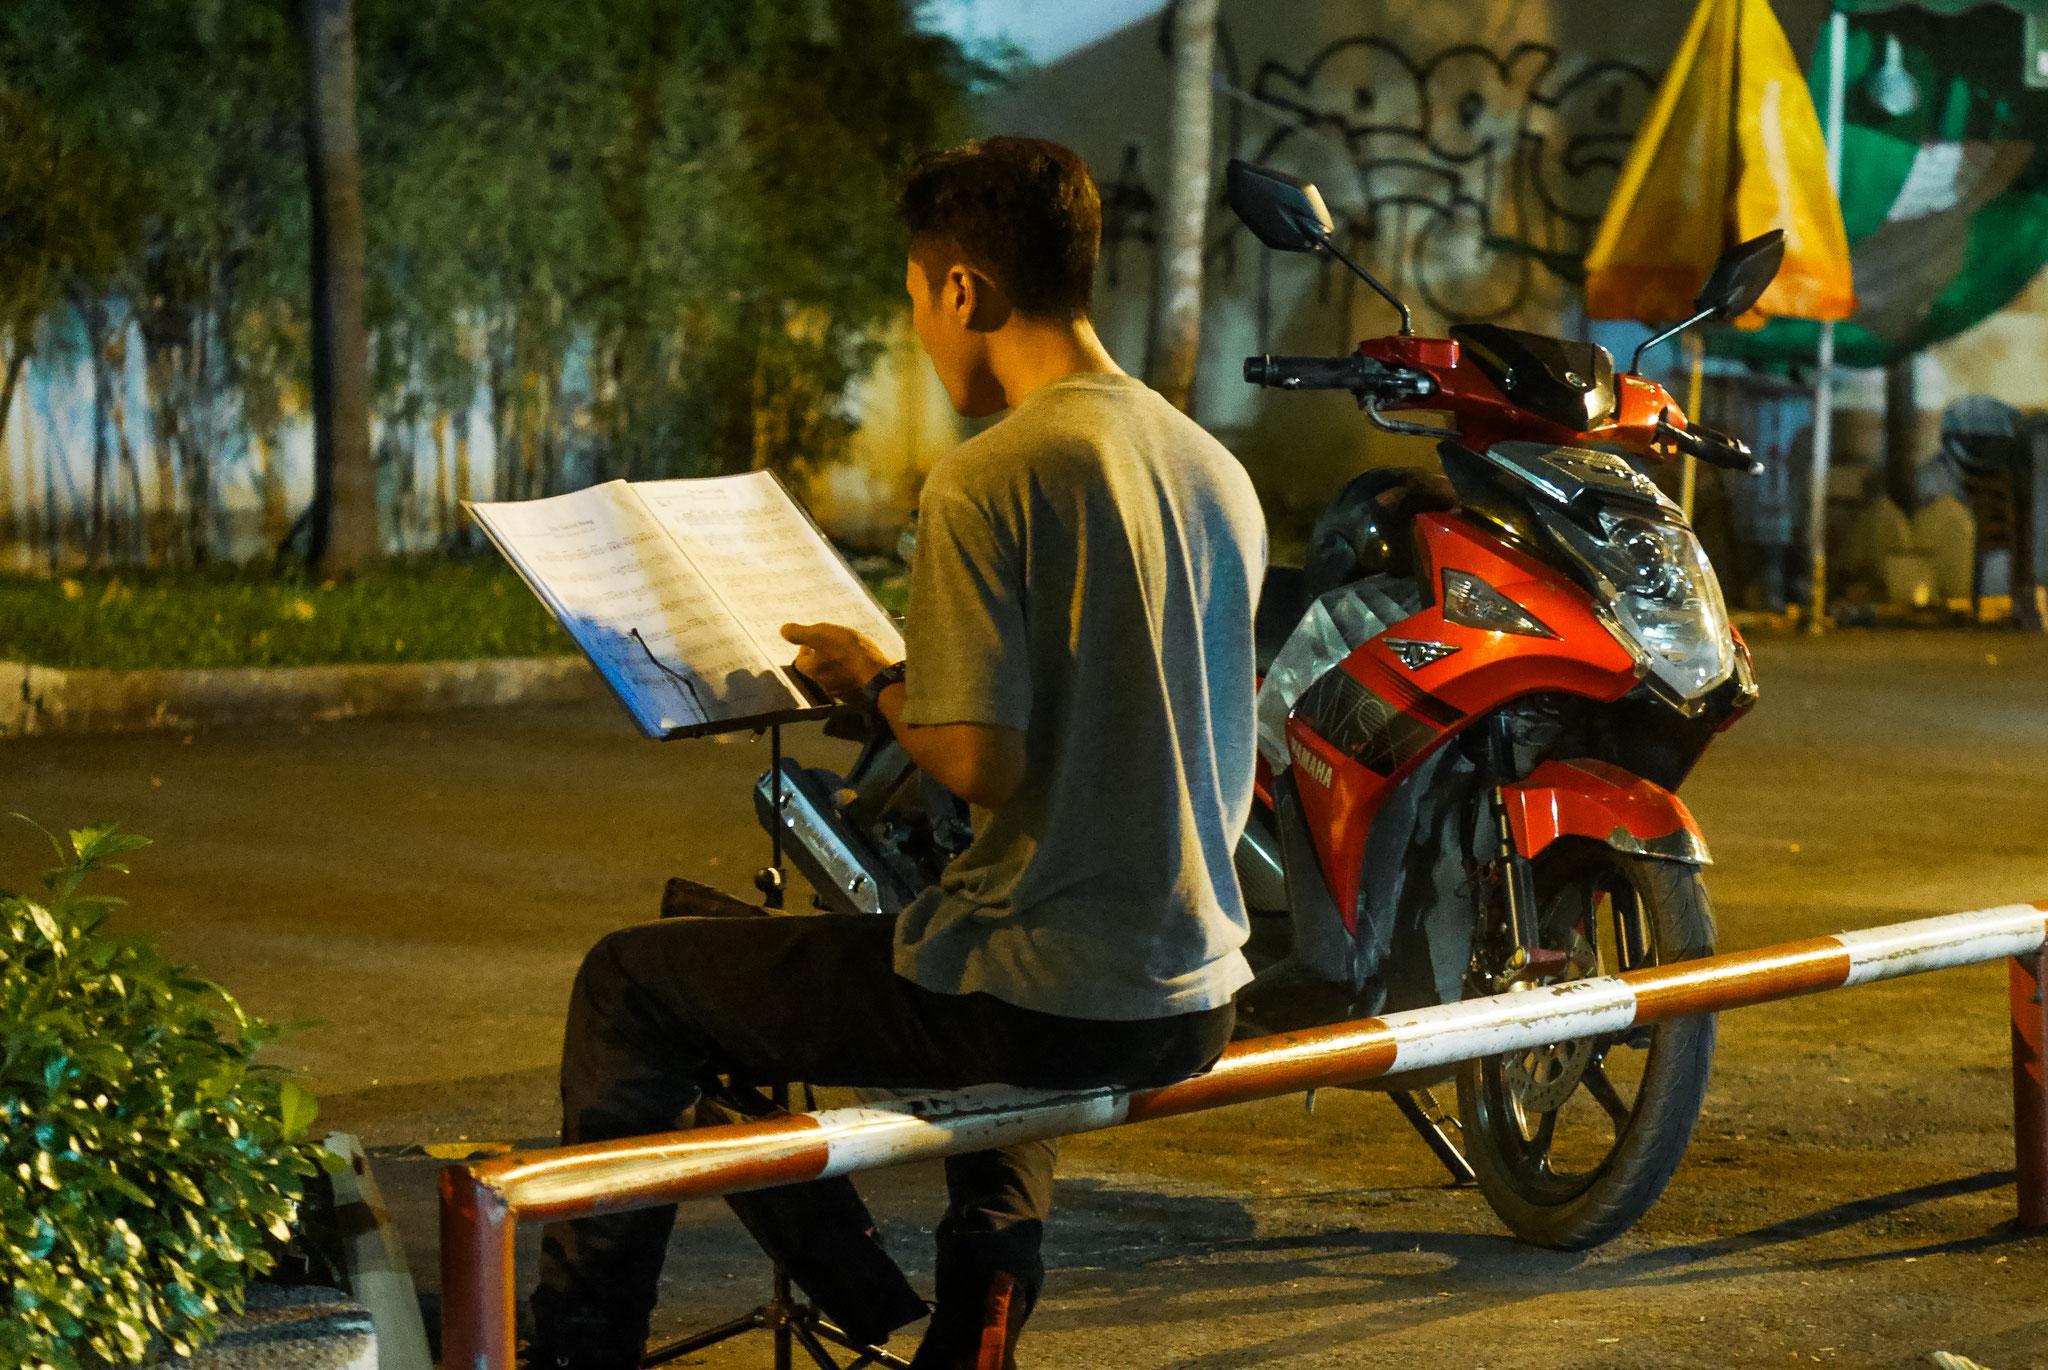 Ho-Chi-Minh-Stadt (Saigon) - Platz zum Üben